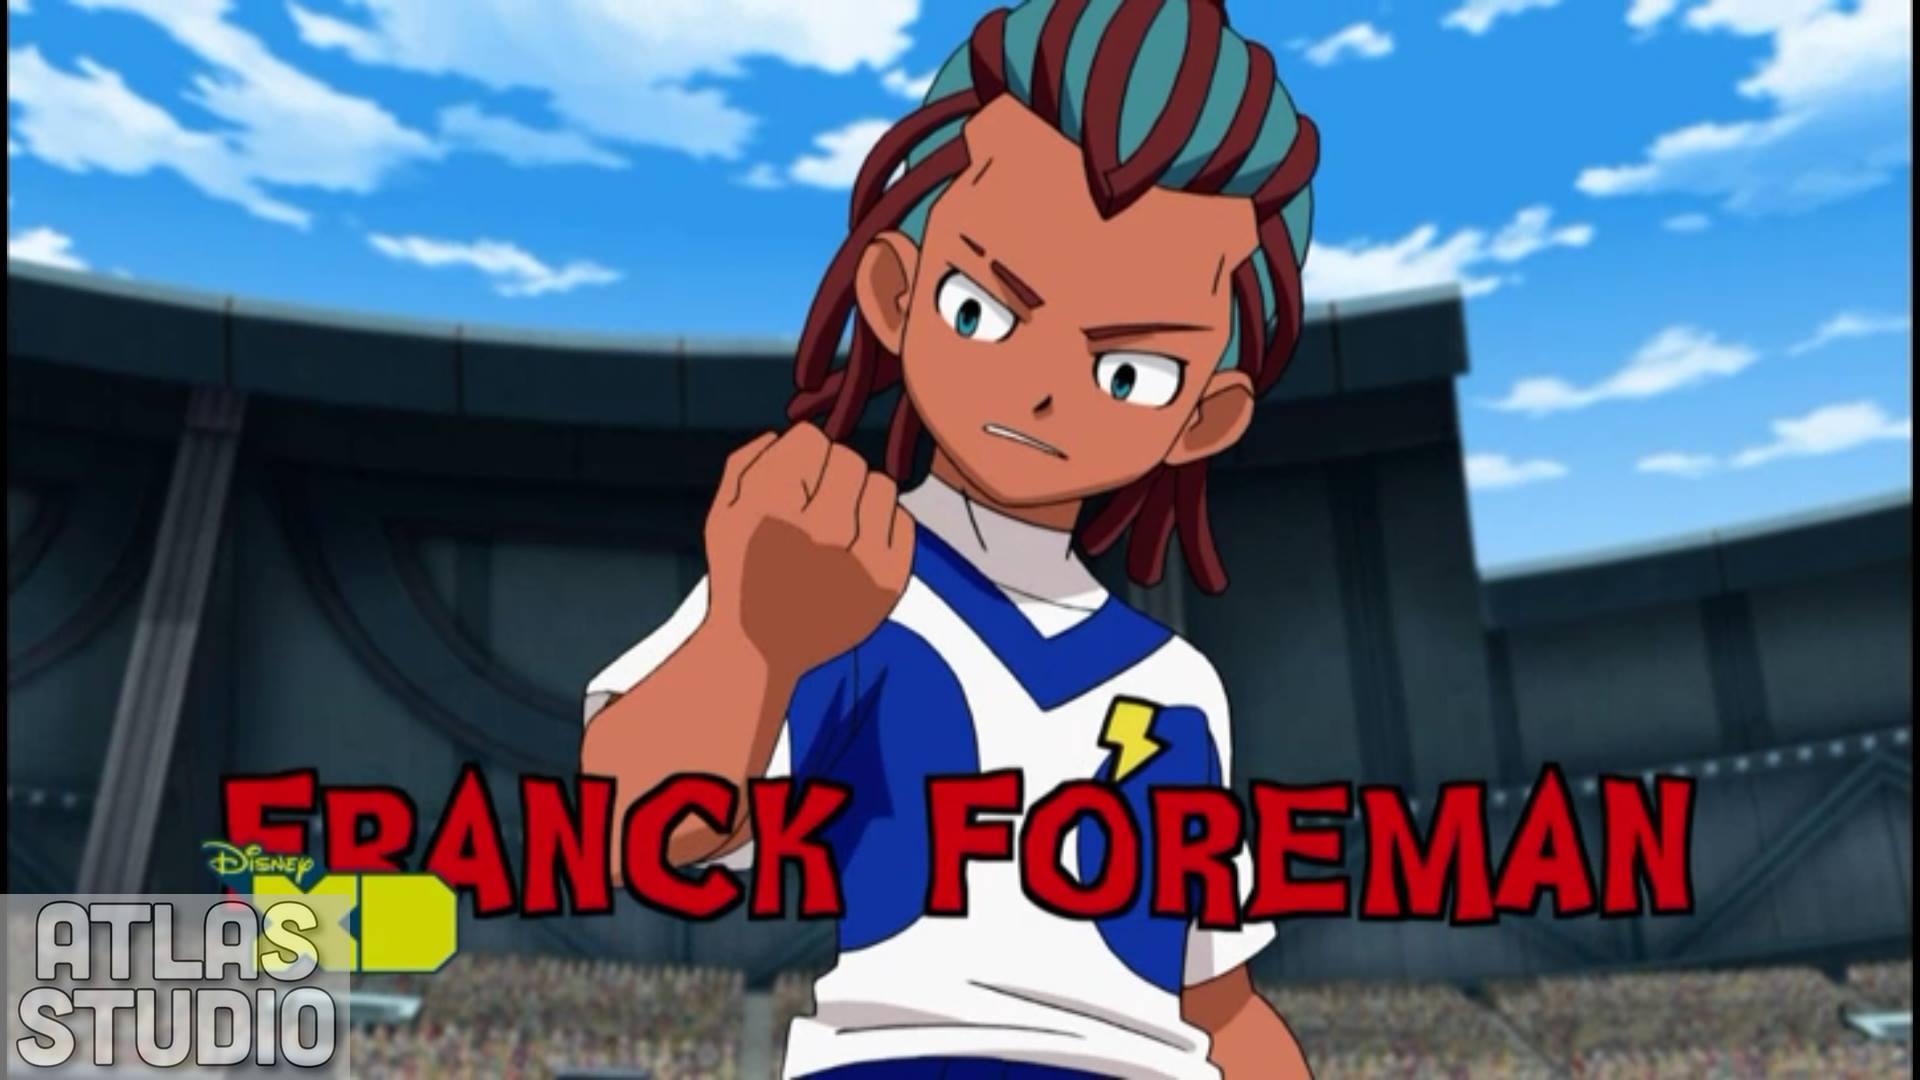 Frank Foreman